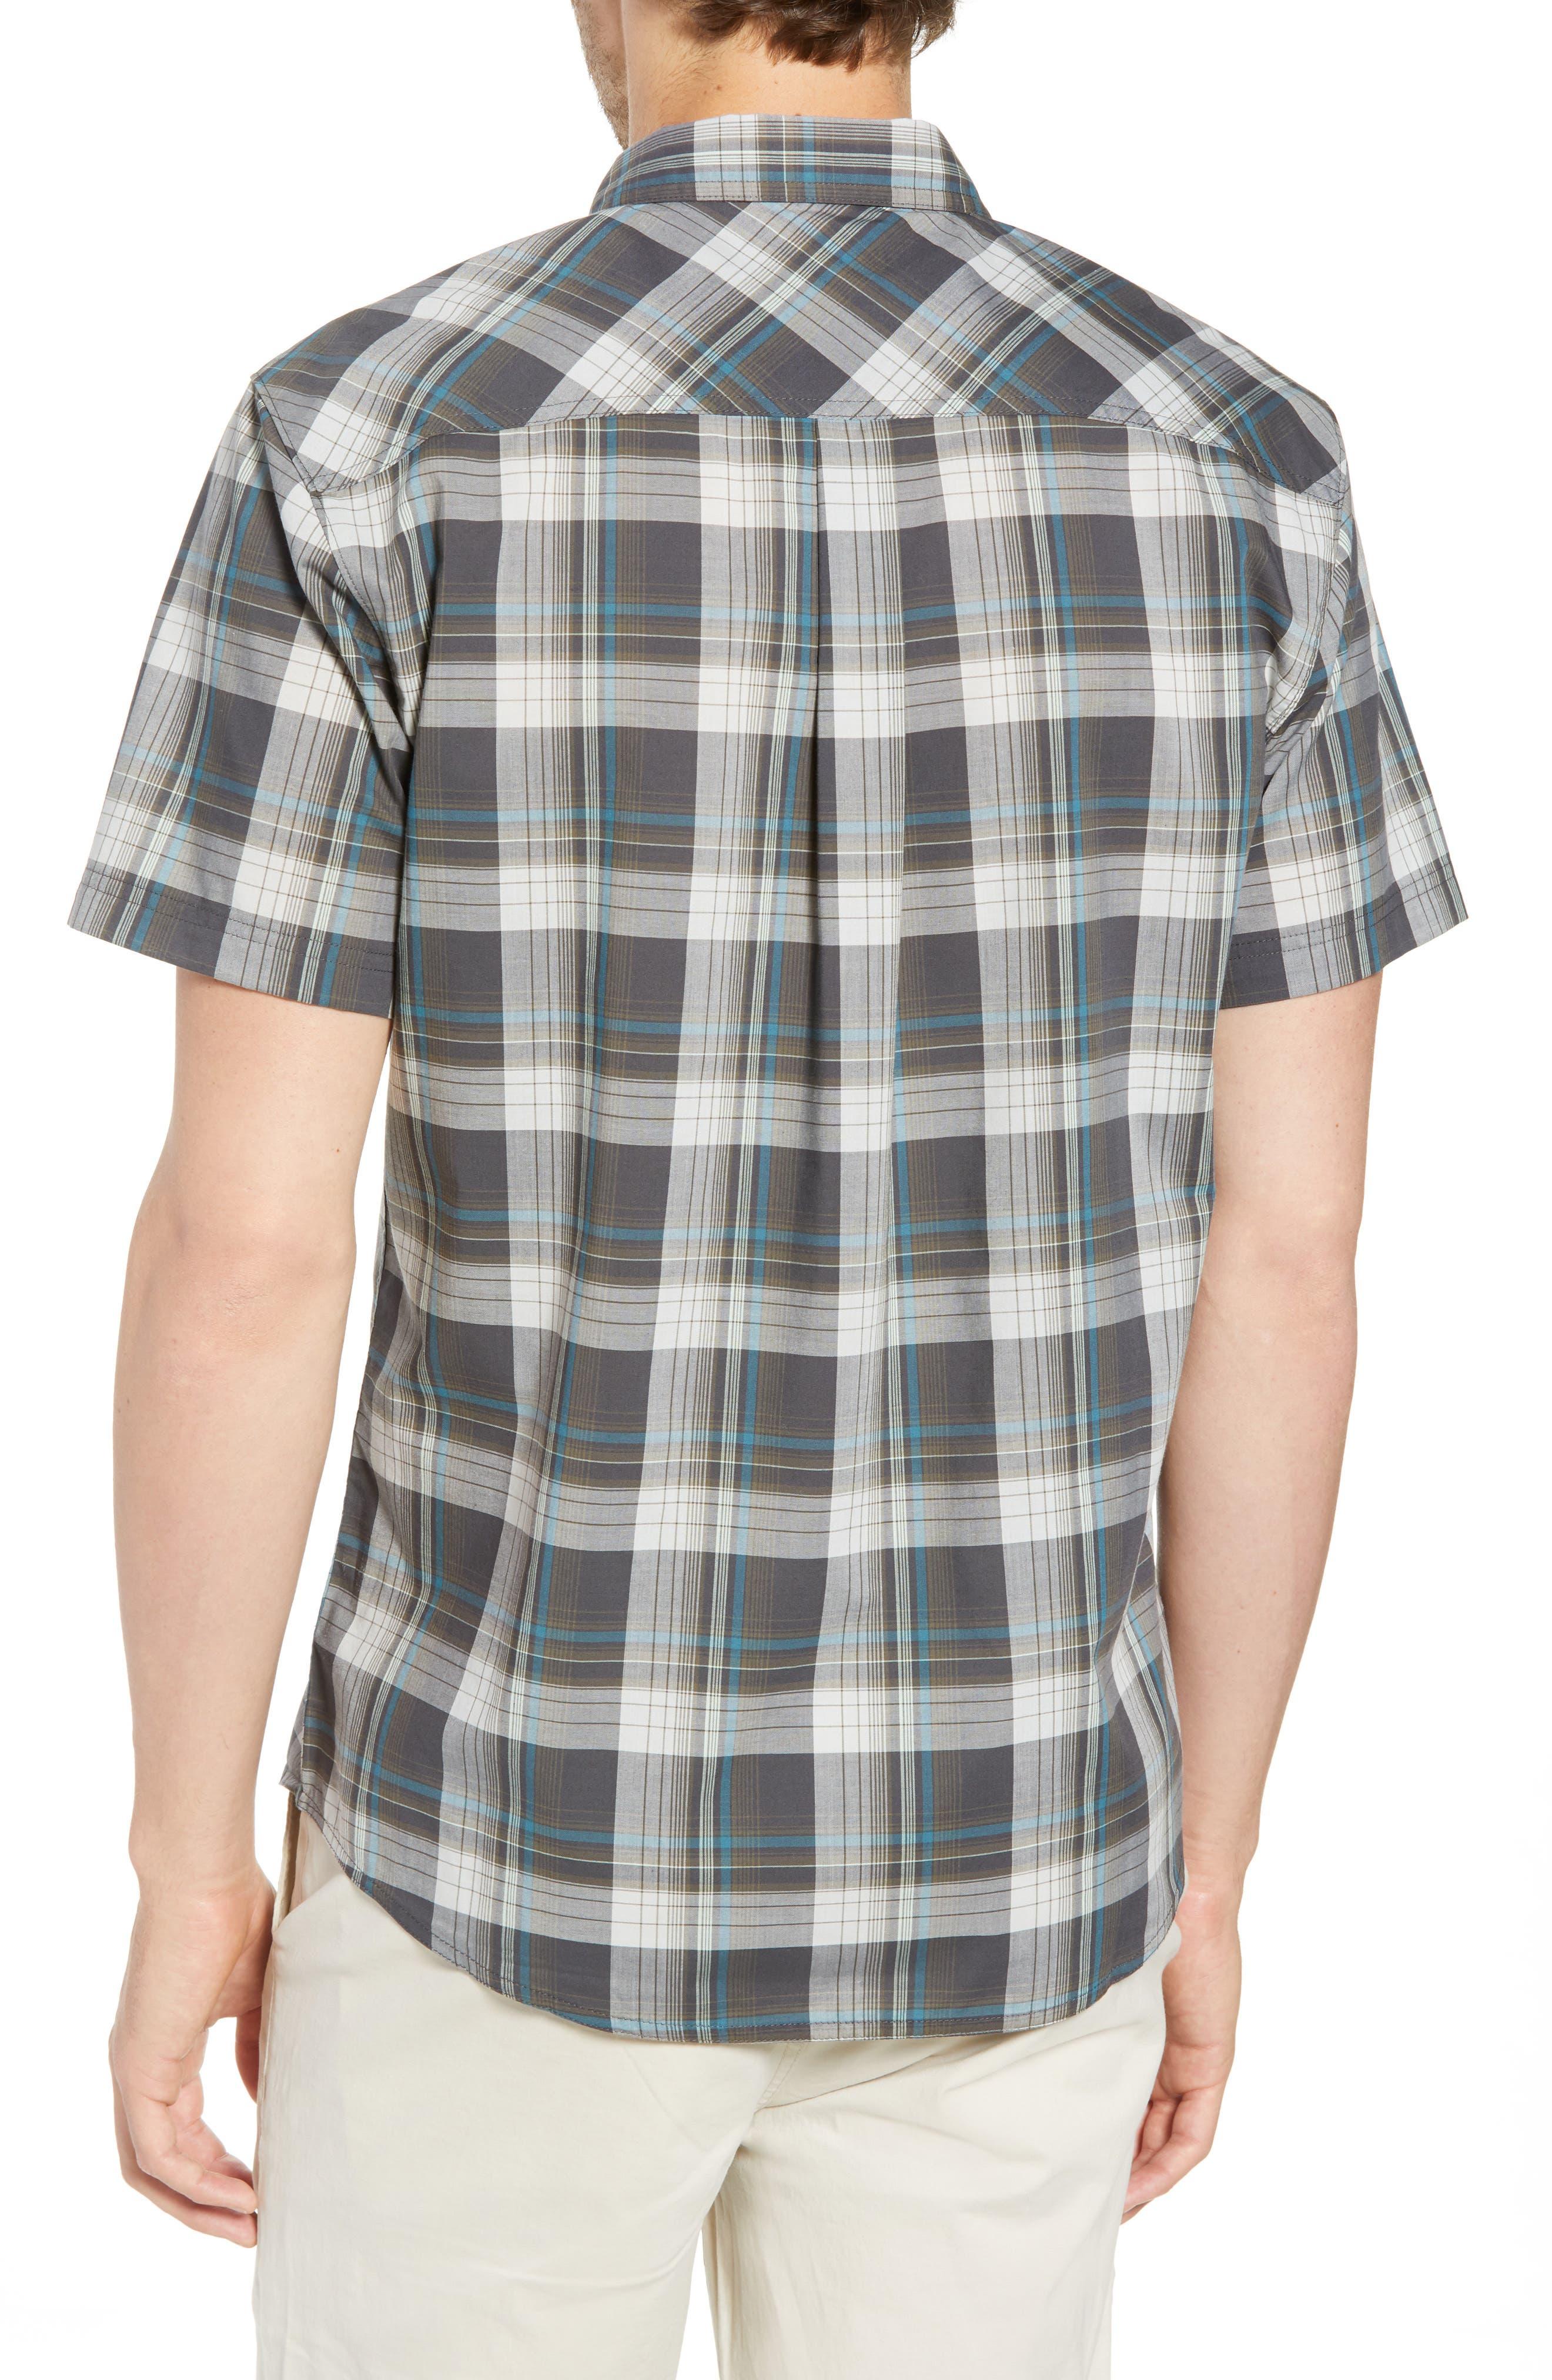 Gentry Short Sleeve Shirt,                             Alternate thumbnail 4, color,